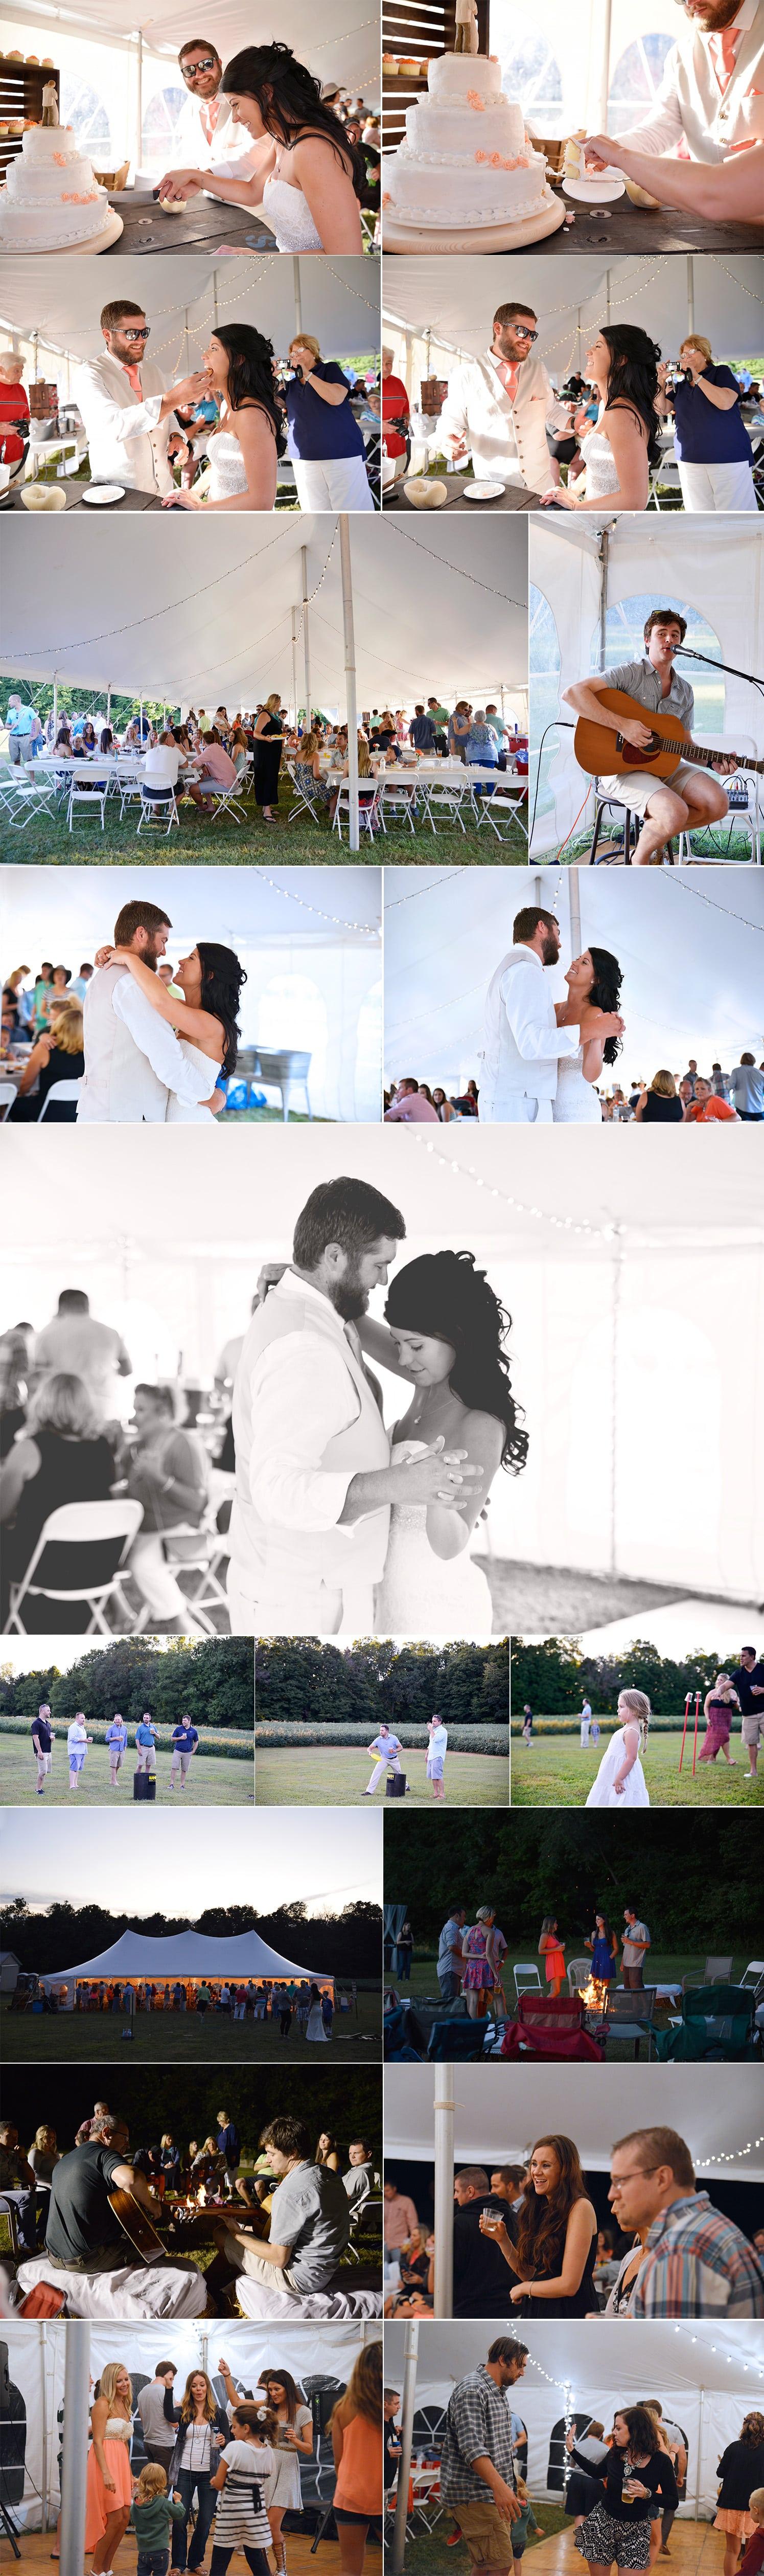 4-country wedding reception mount vernon Ohio